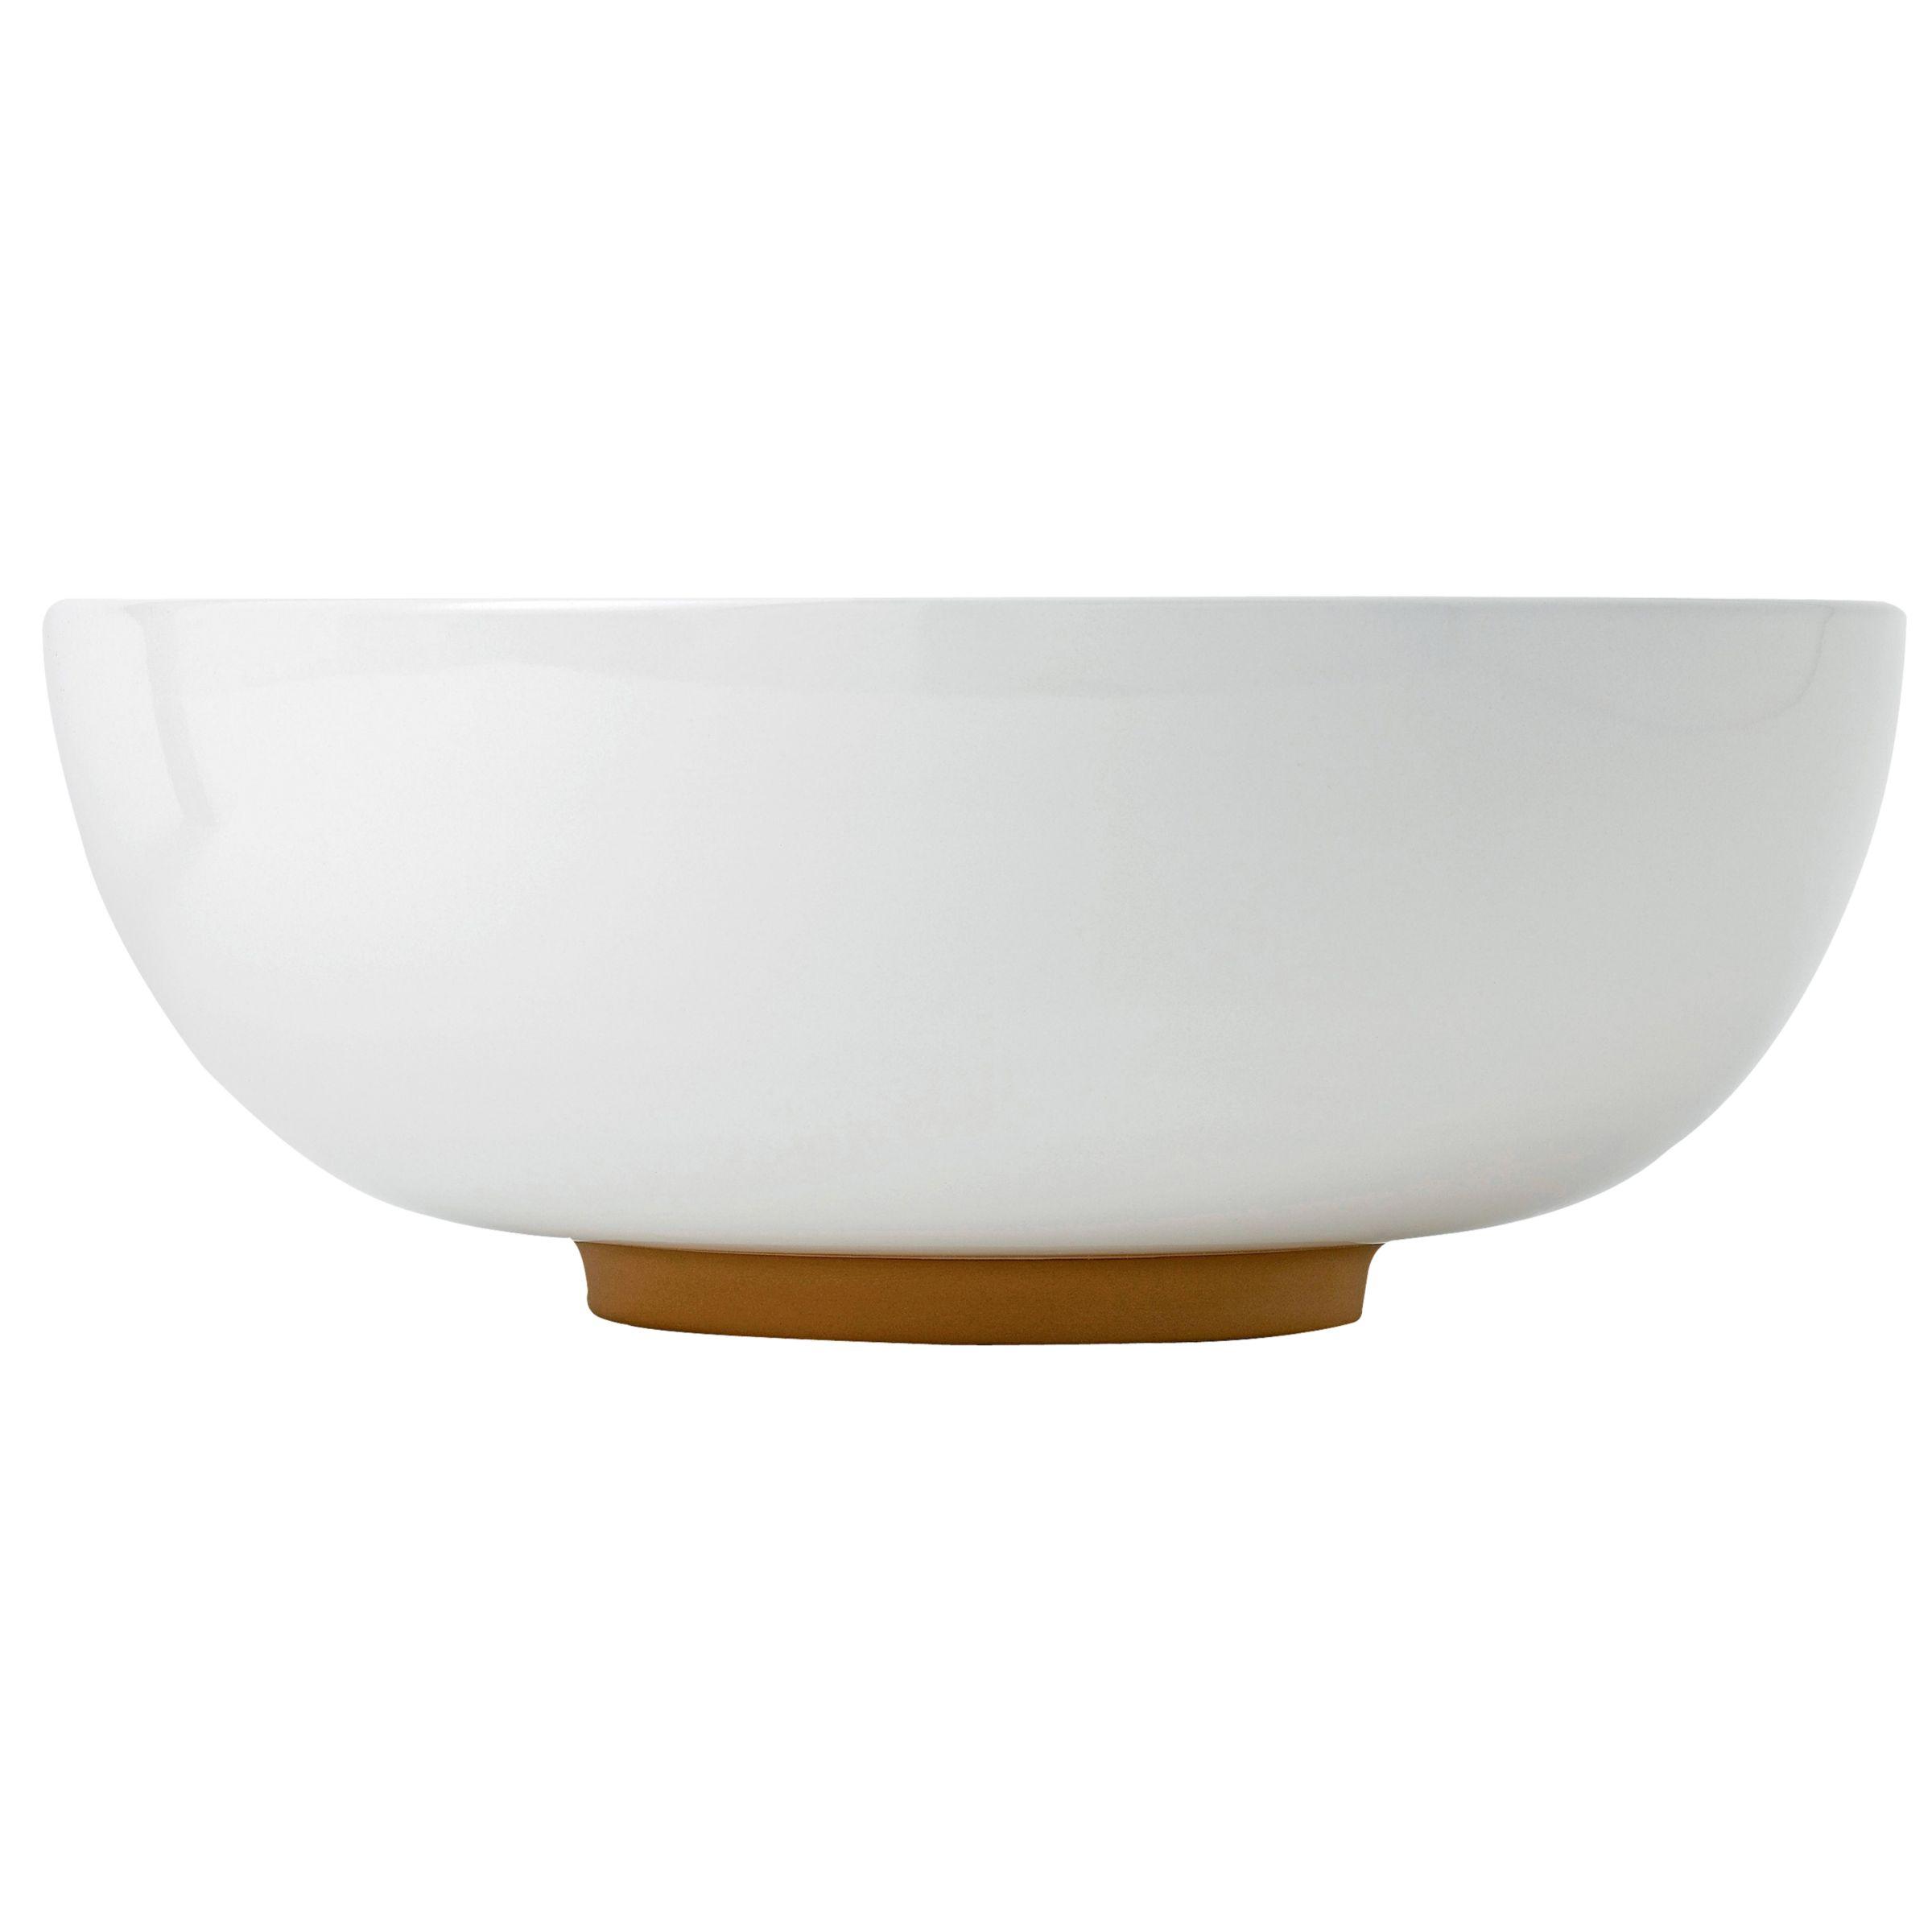 Royal Doulton Royal Doulton Olio 25.5cm Serve Bowl, White